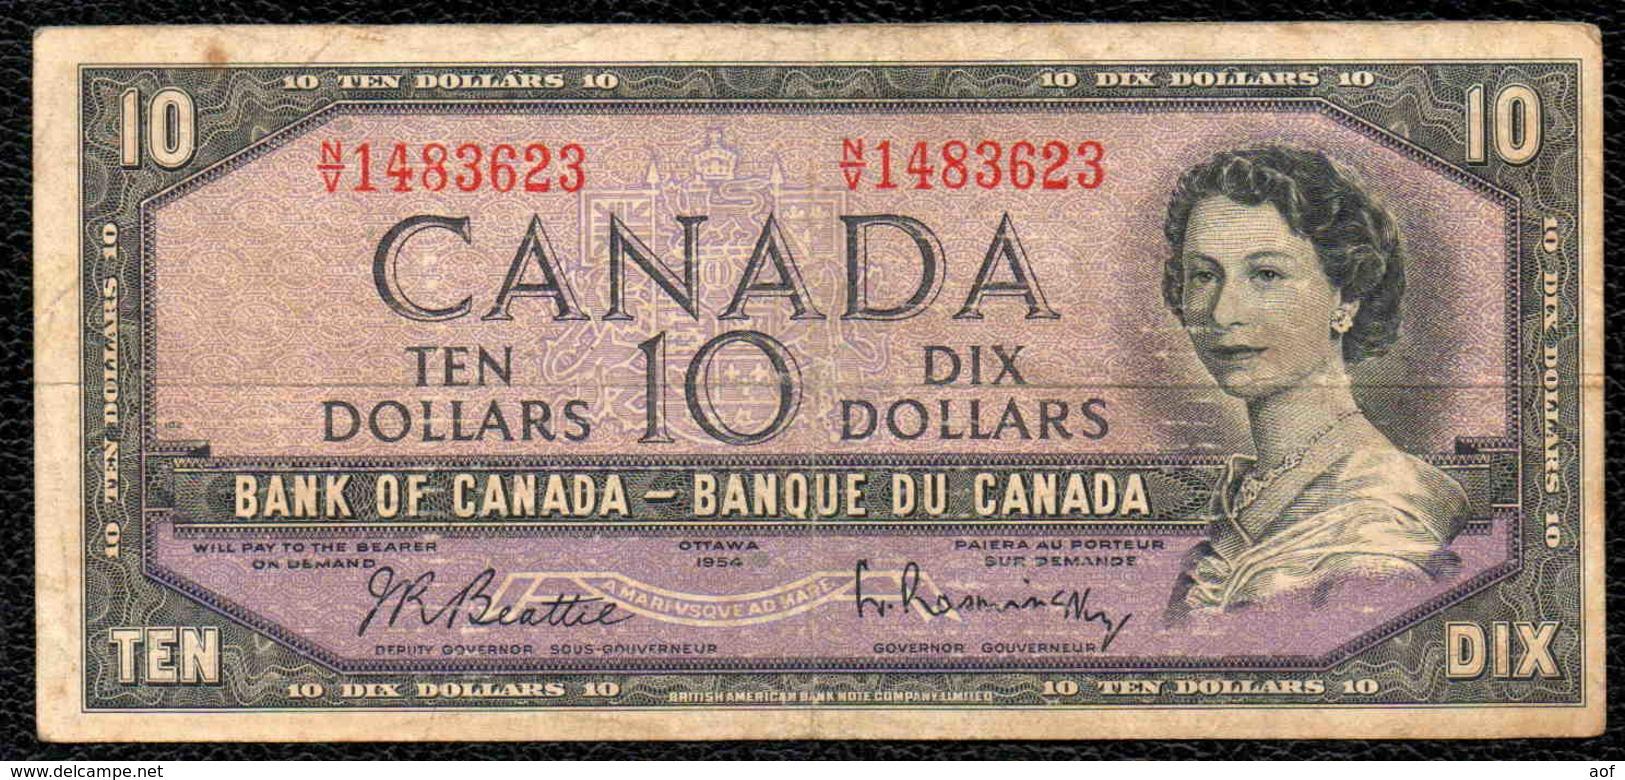 10 CANADA - Canada